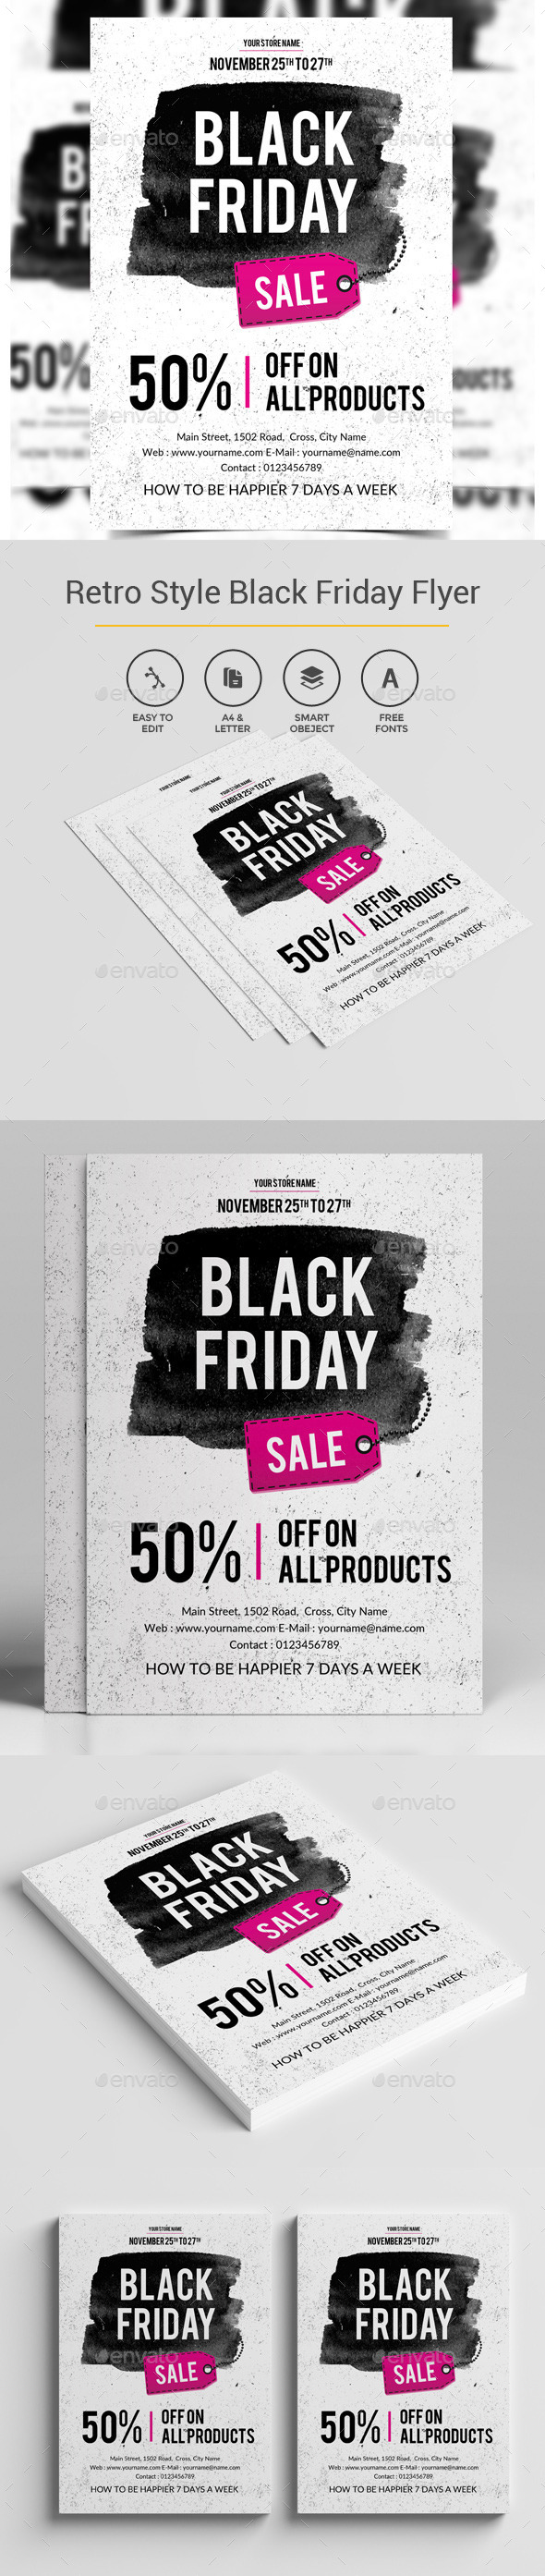 Black Friday Flyer Template PSD #design Download: http://graphicriver.net/item/black-friday-flyer/13617286?ref=ksioks